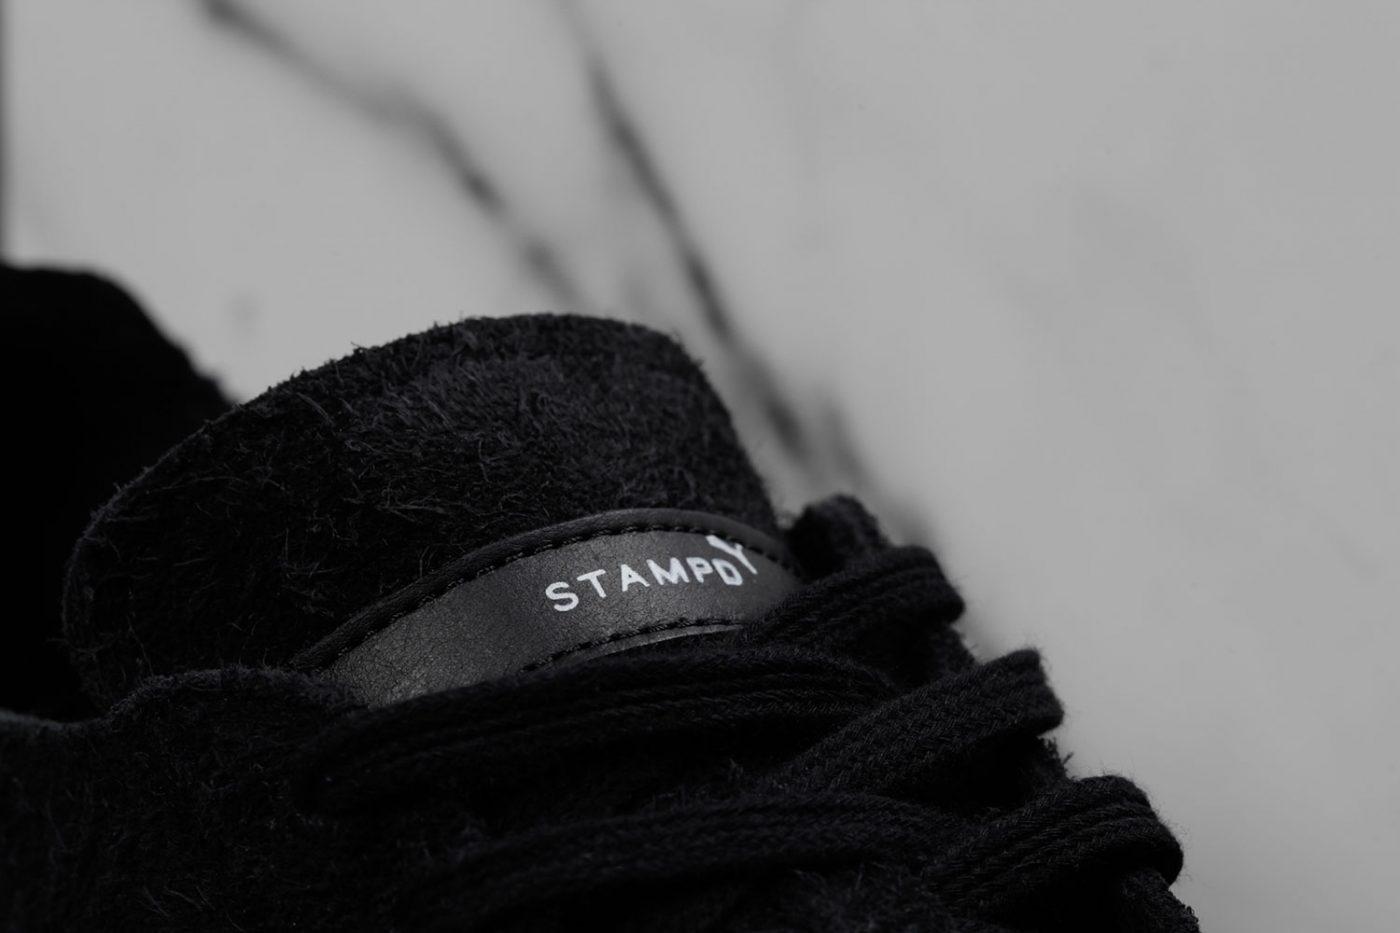 STAMPD-Puma-B-G-States-Life-9